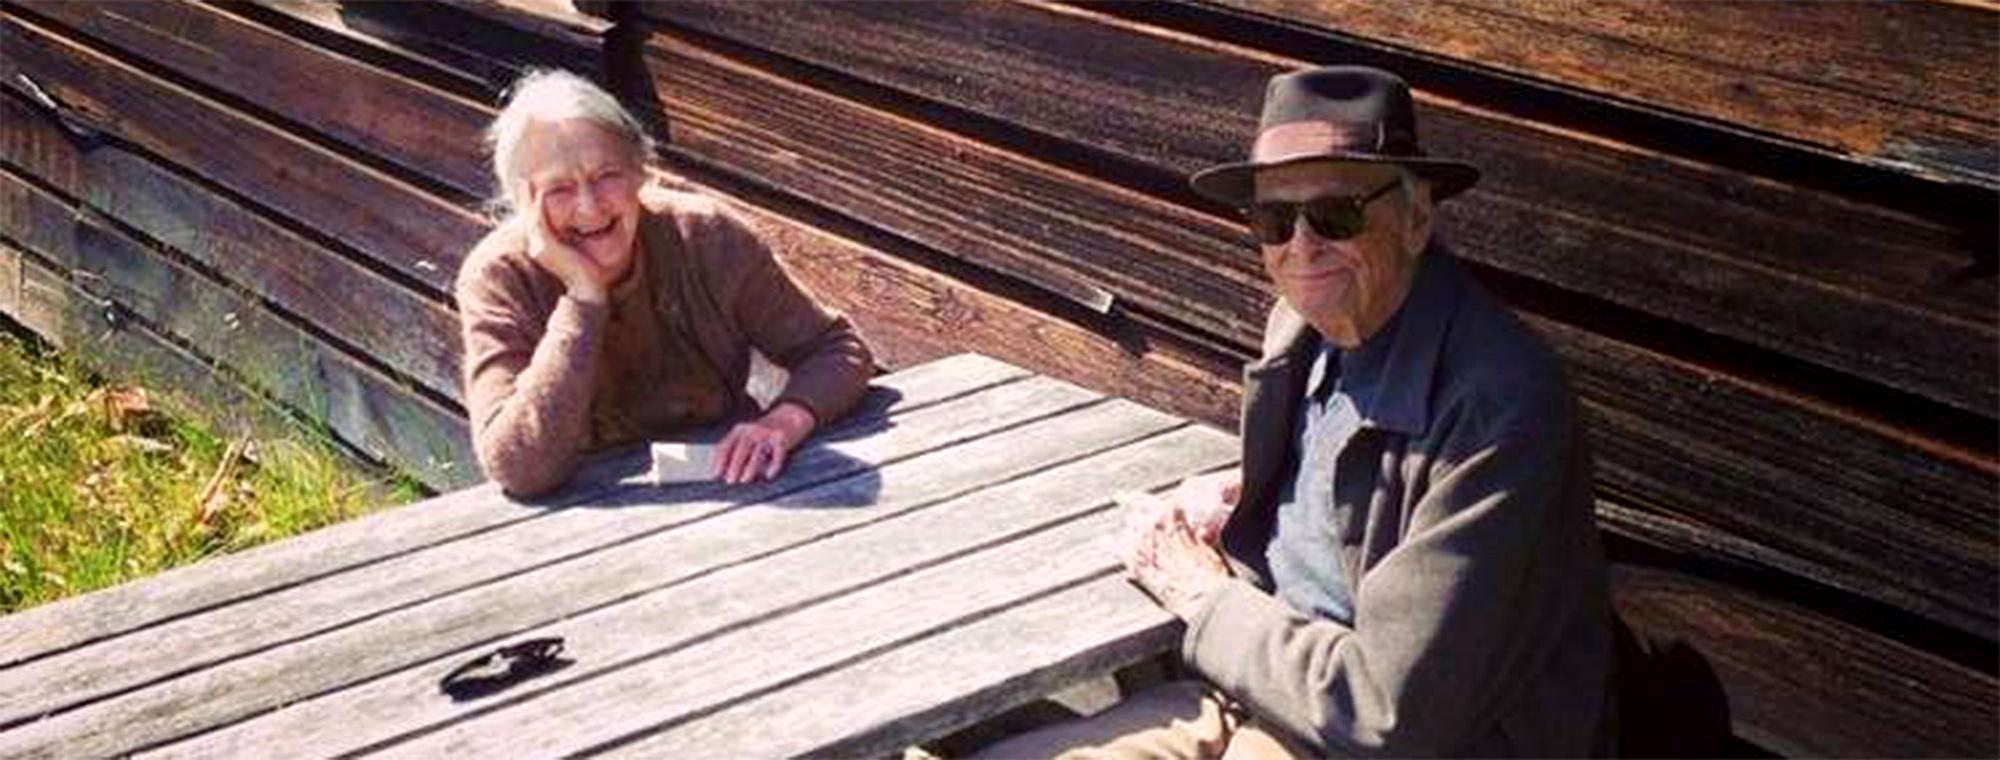 Bill and Joan Roth